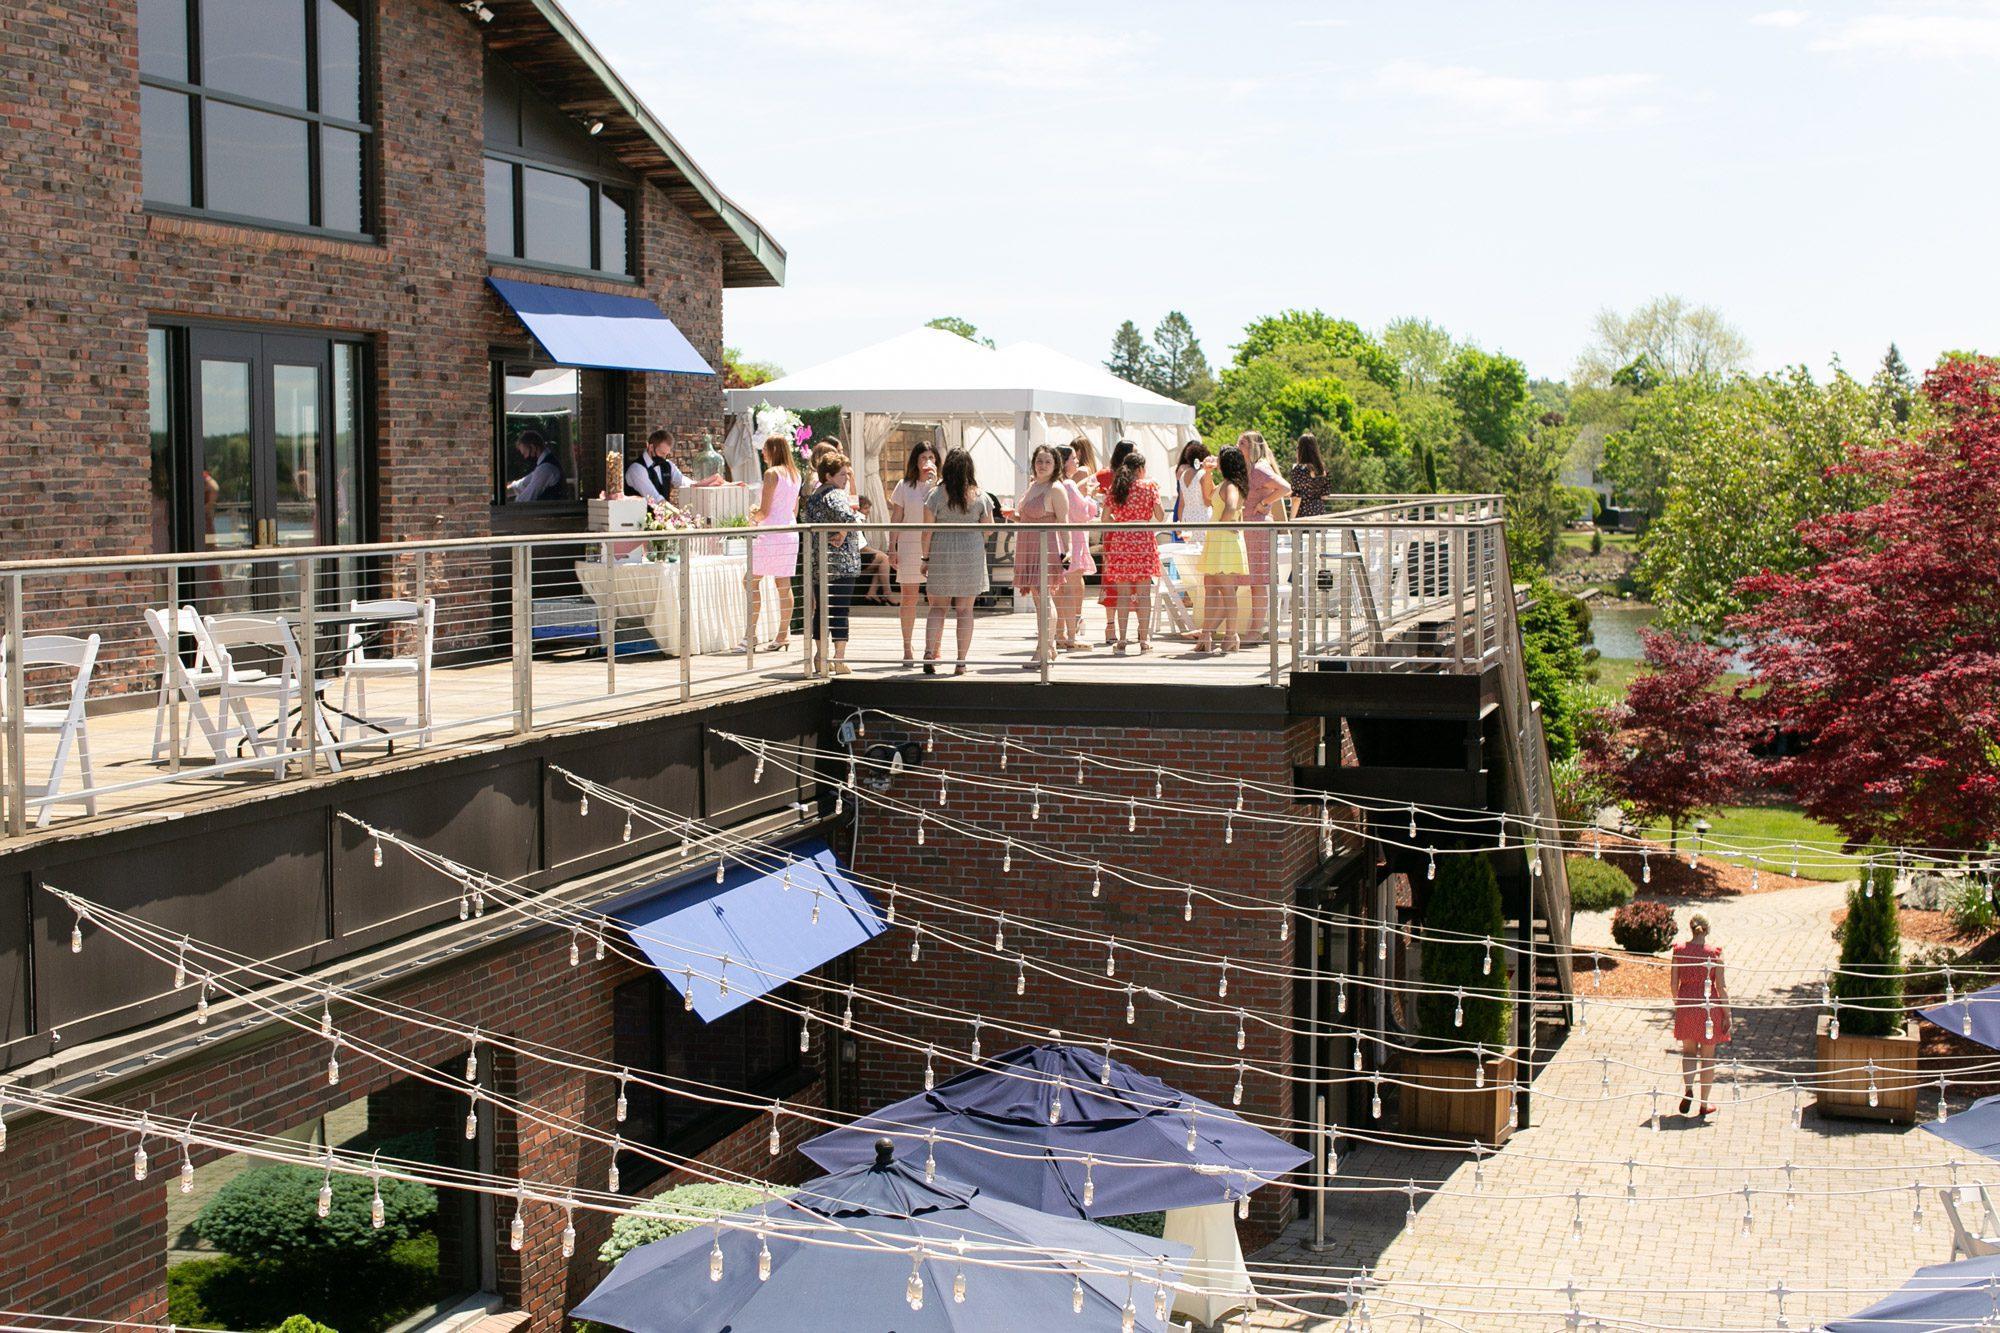 Women enjoying the deck attached to Harborview Ballroom at Danversport in Danvers, Massachusetts